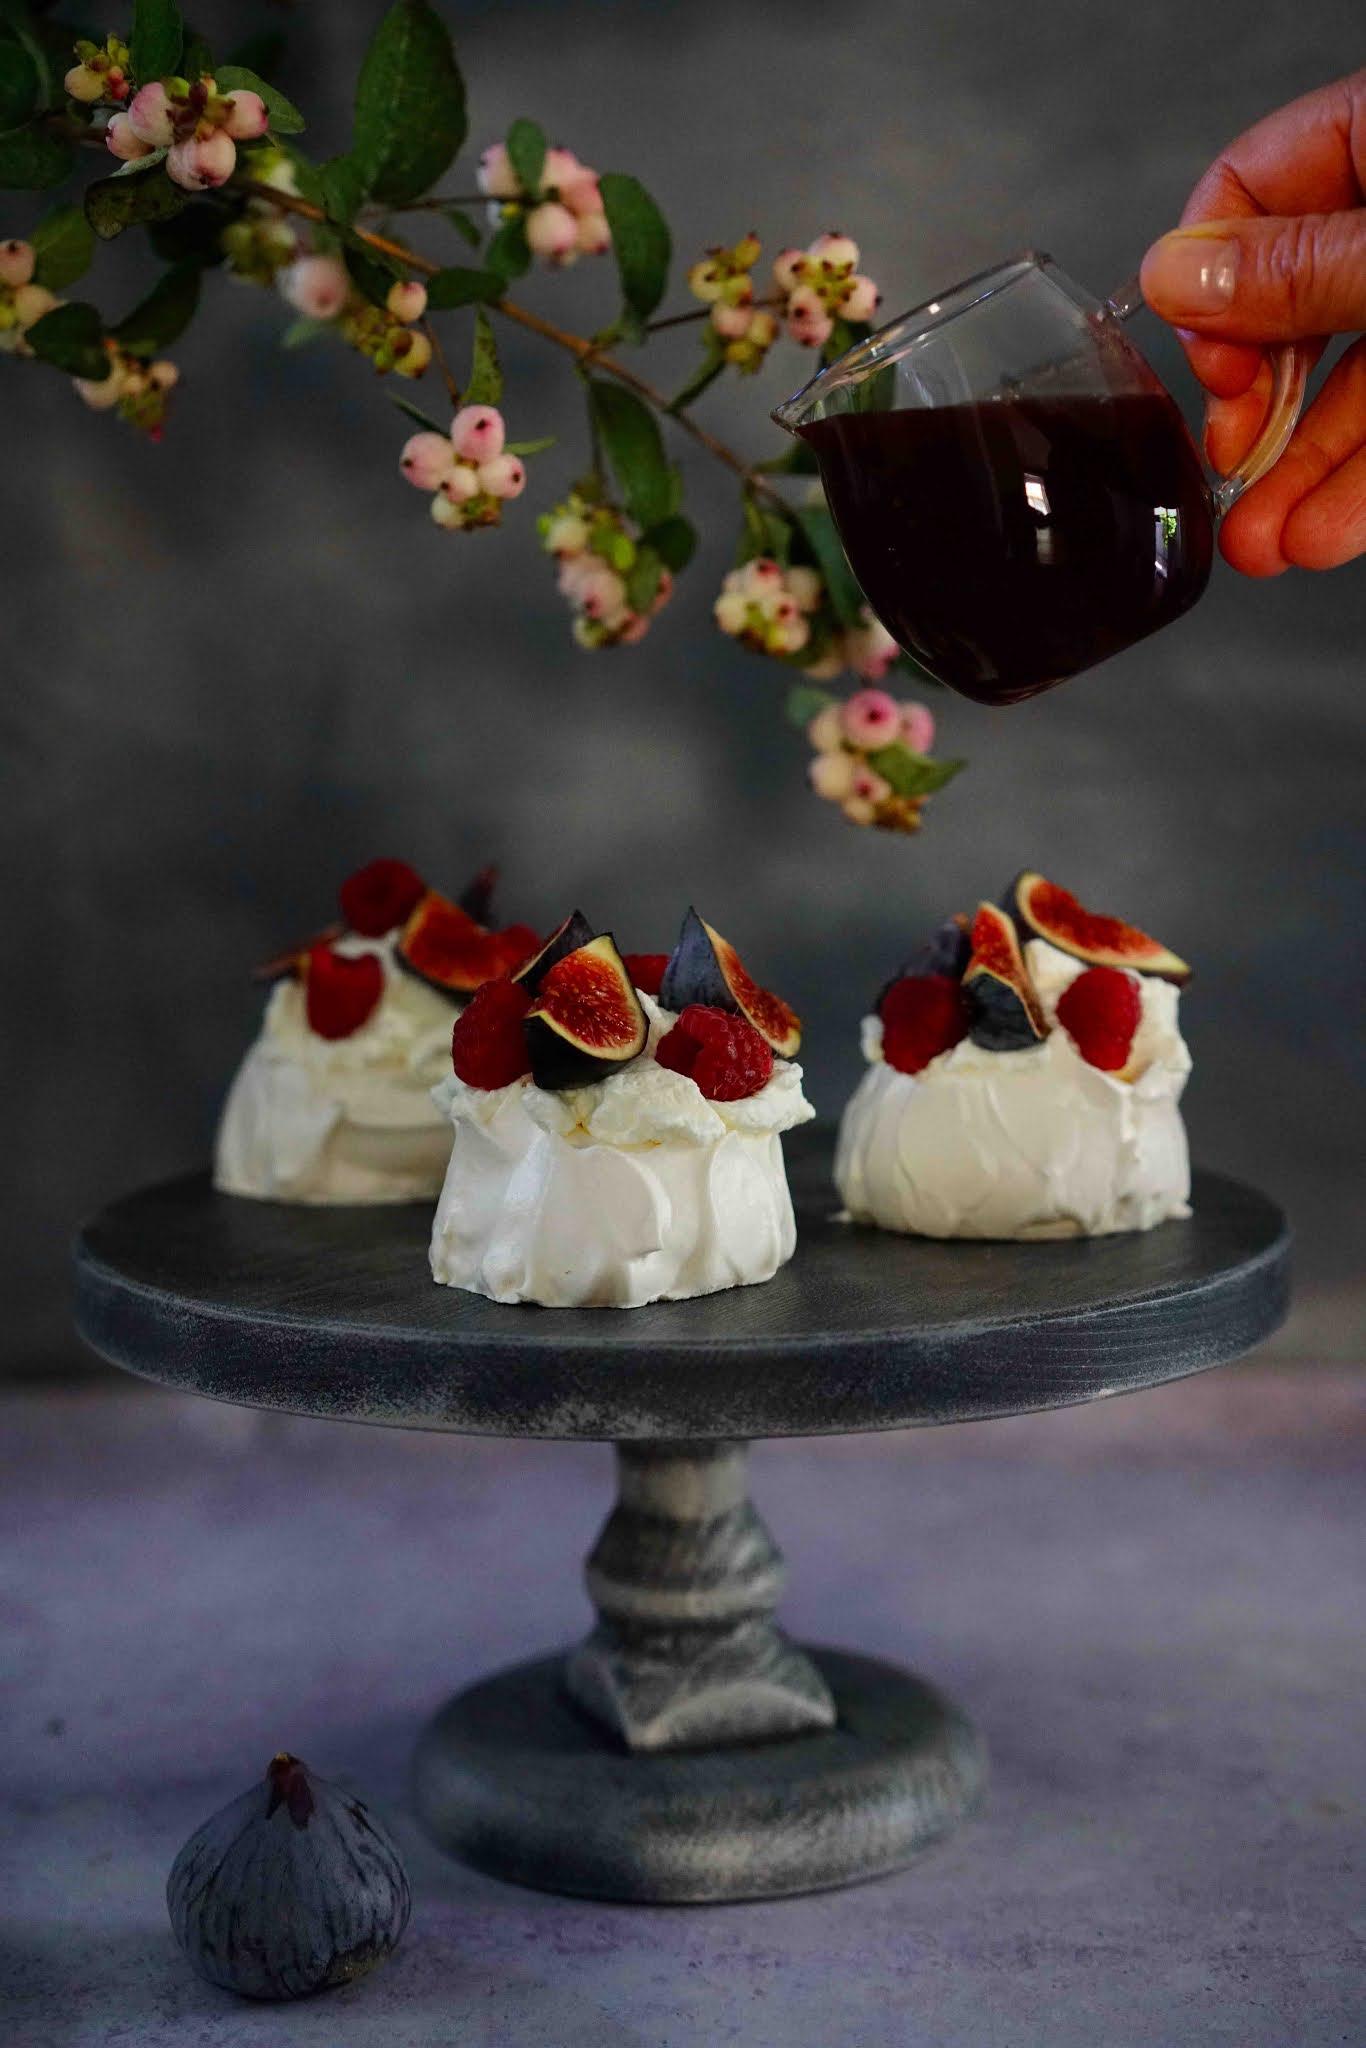 pavlova , sirop de grenade aux épices , chantilly , dessert festif